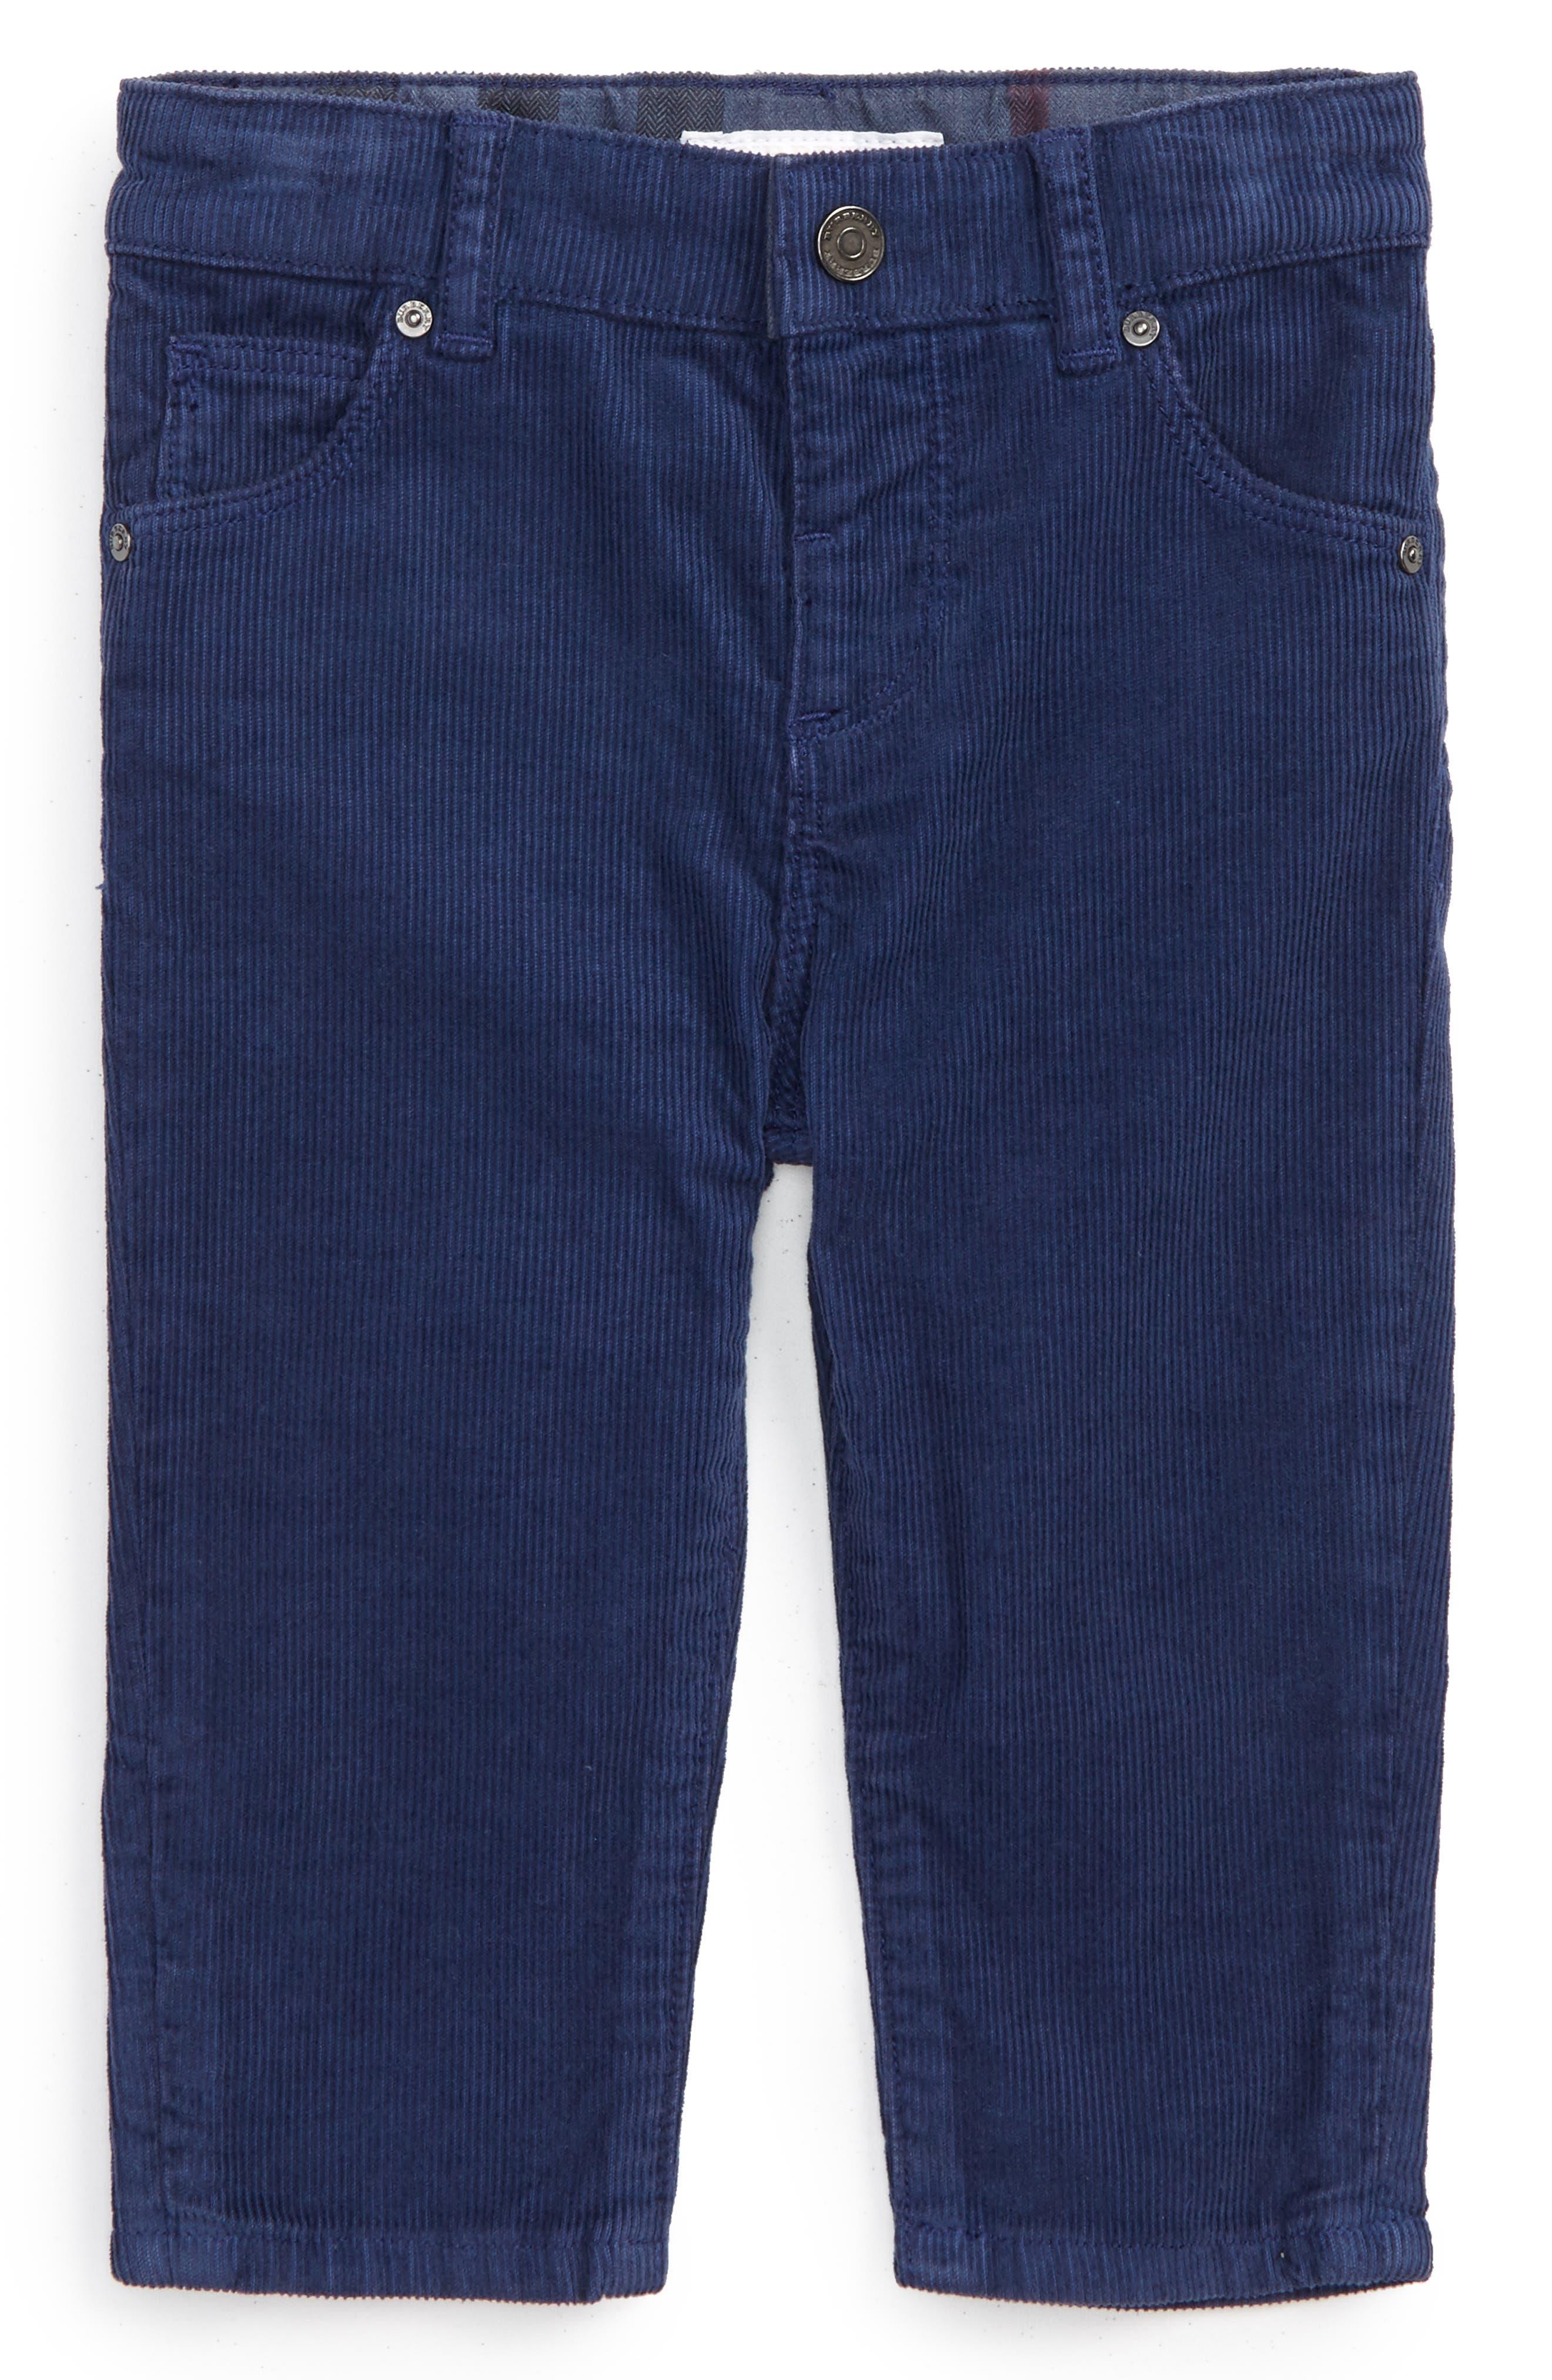 Langston Corduroy Skinny Pants,                             Main thumbnail 1, color,                             Blue